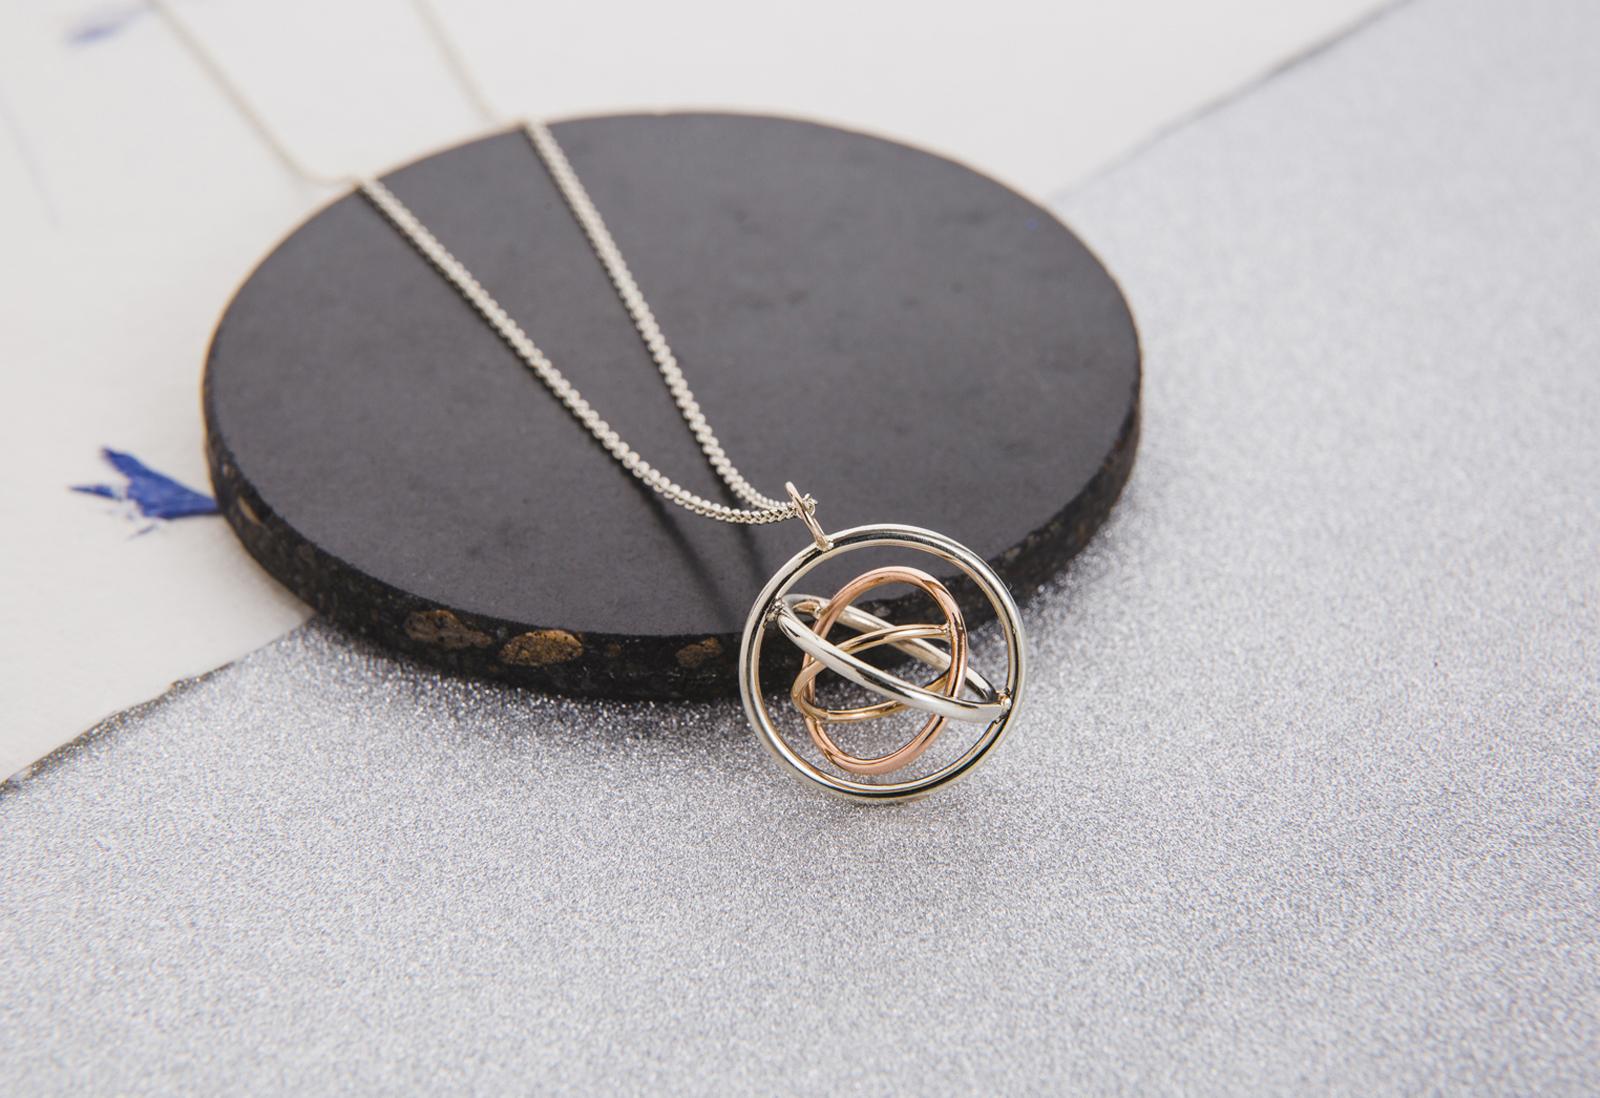 Judith Peterhoff Jewellery - bespoke handmade family pendant in 9ct gold